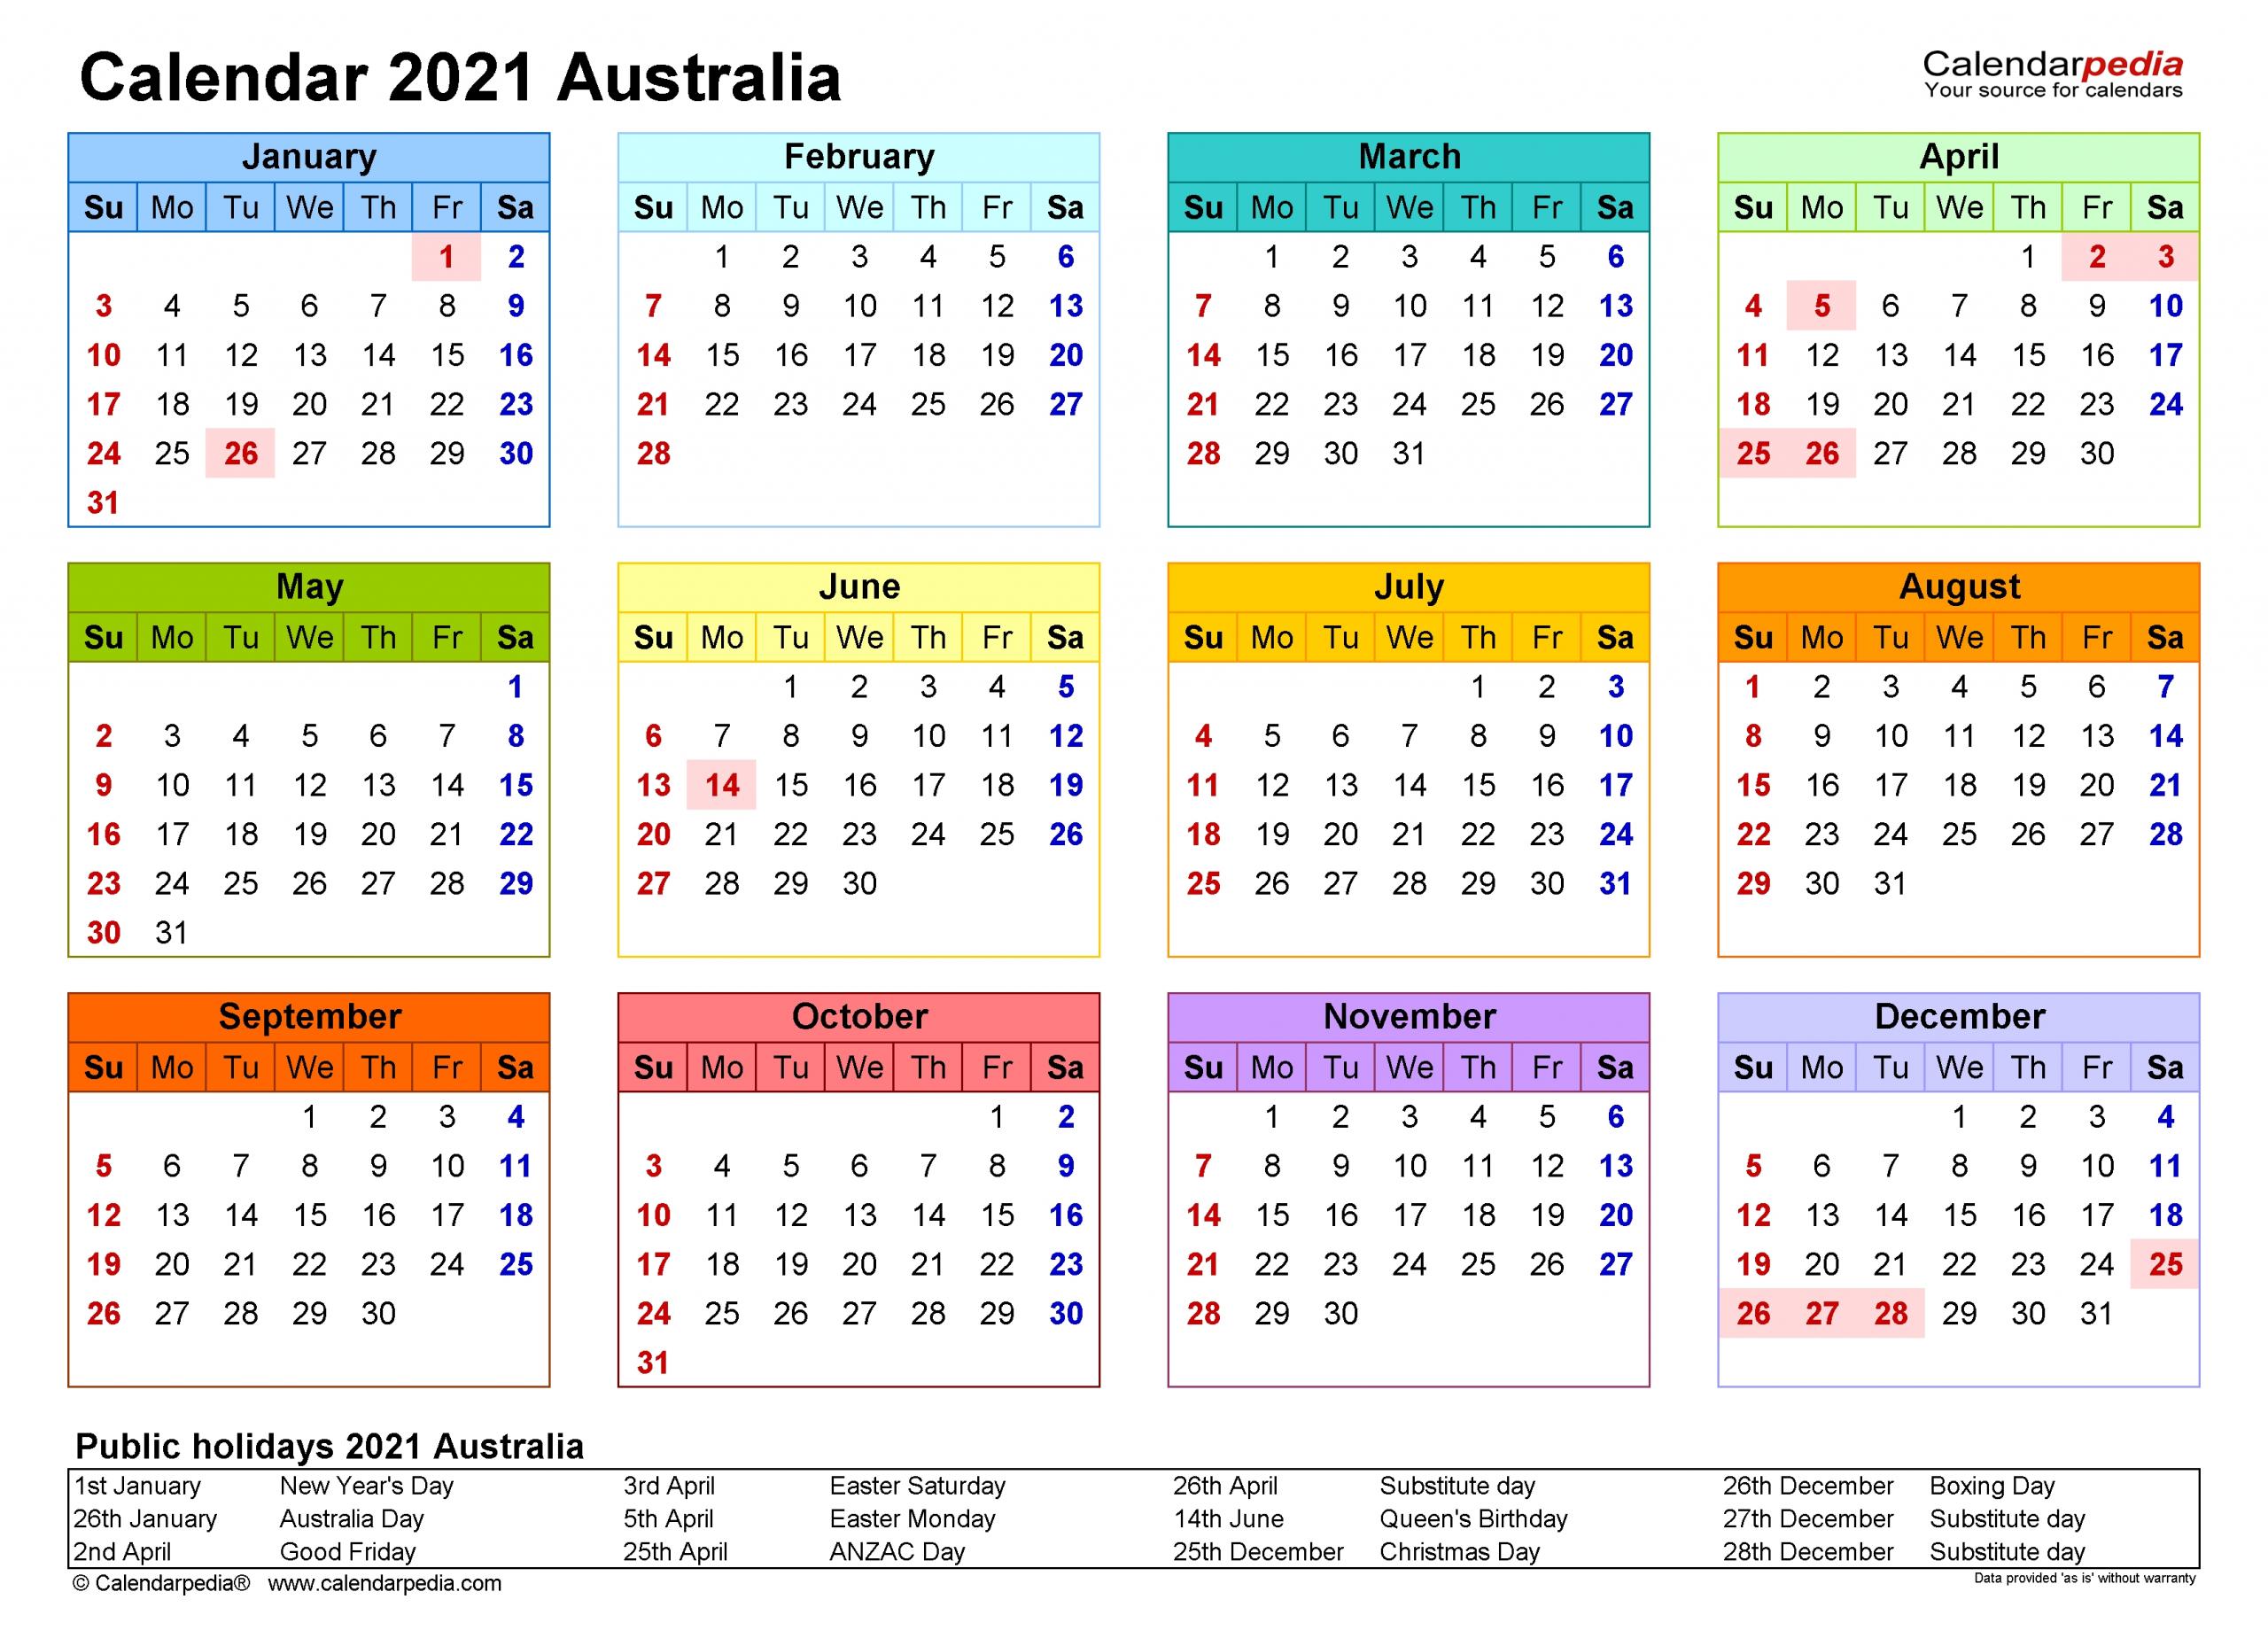 Australia Calendar 2021 - Free Printable Pdf Templates  Fiscal Calendar Australia 2021